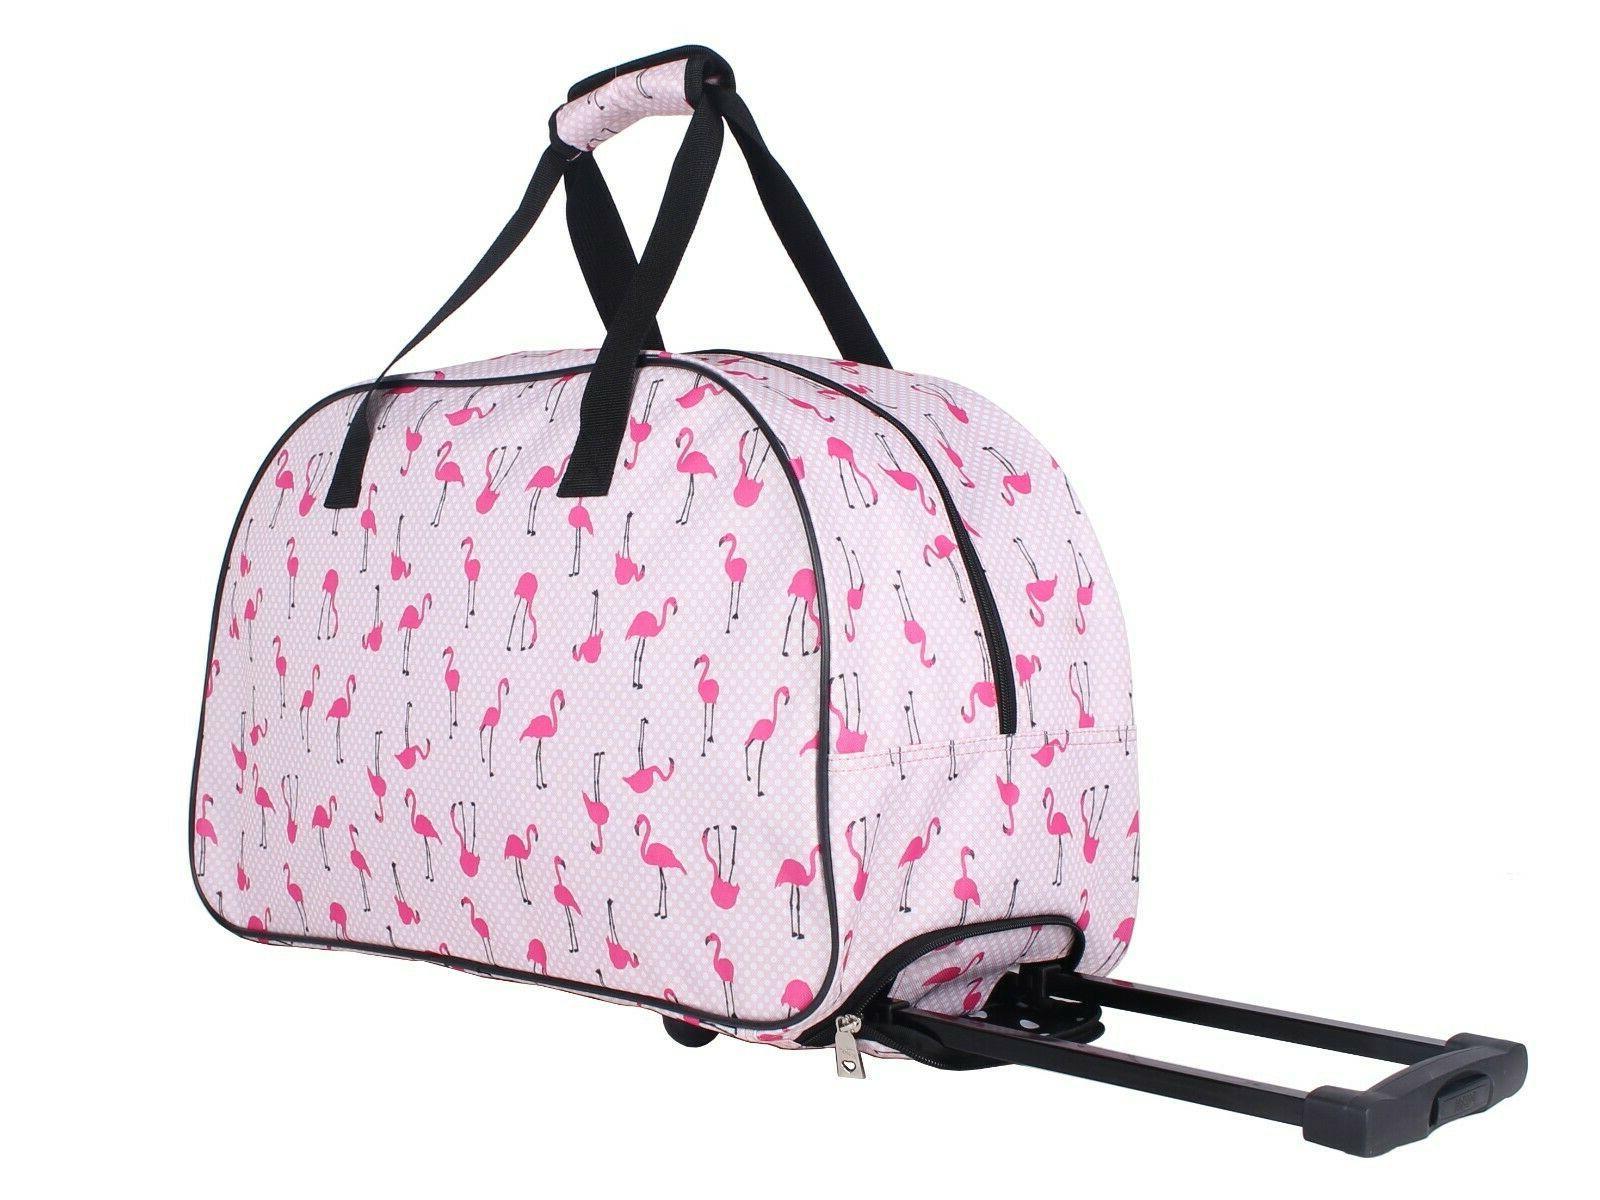 Betsey Designer Carry On - Duffel Bag